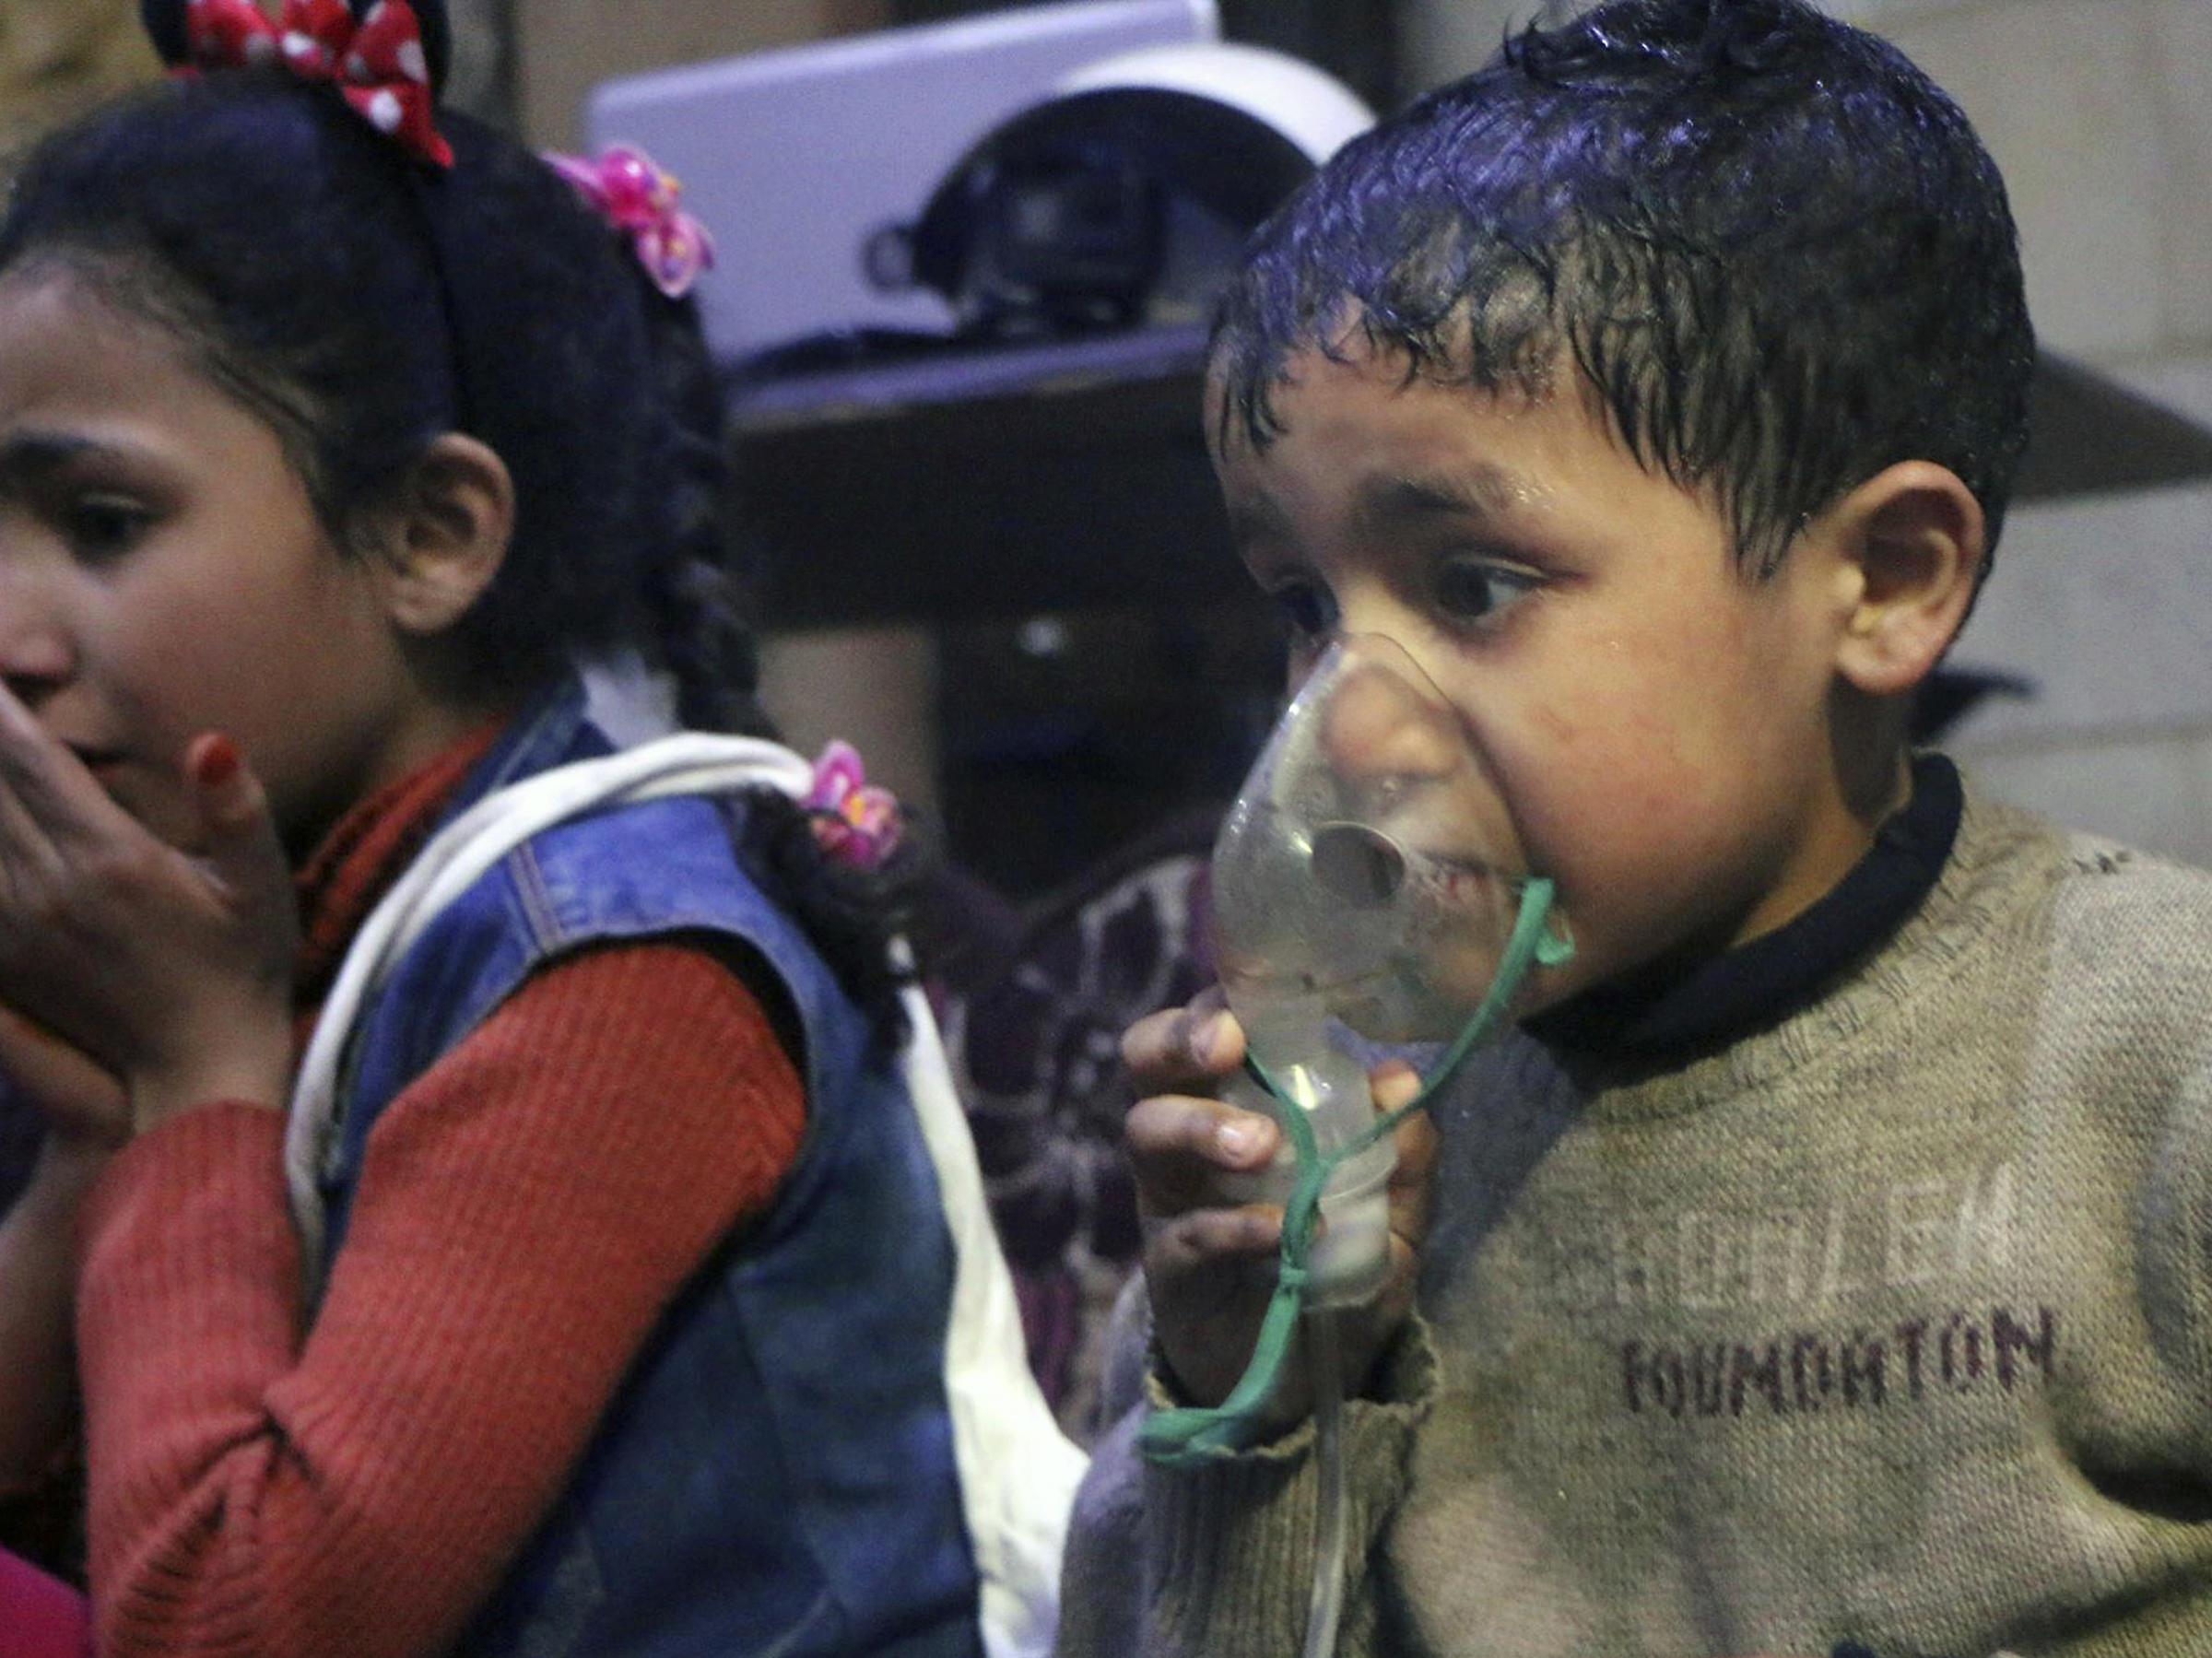 Gas attack in Syria